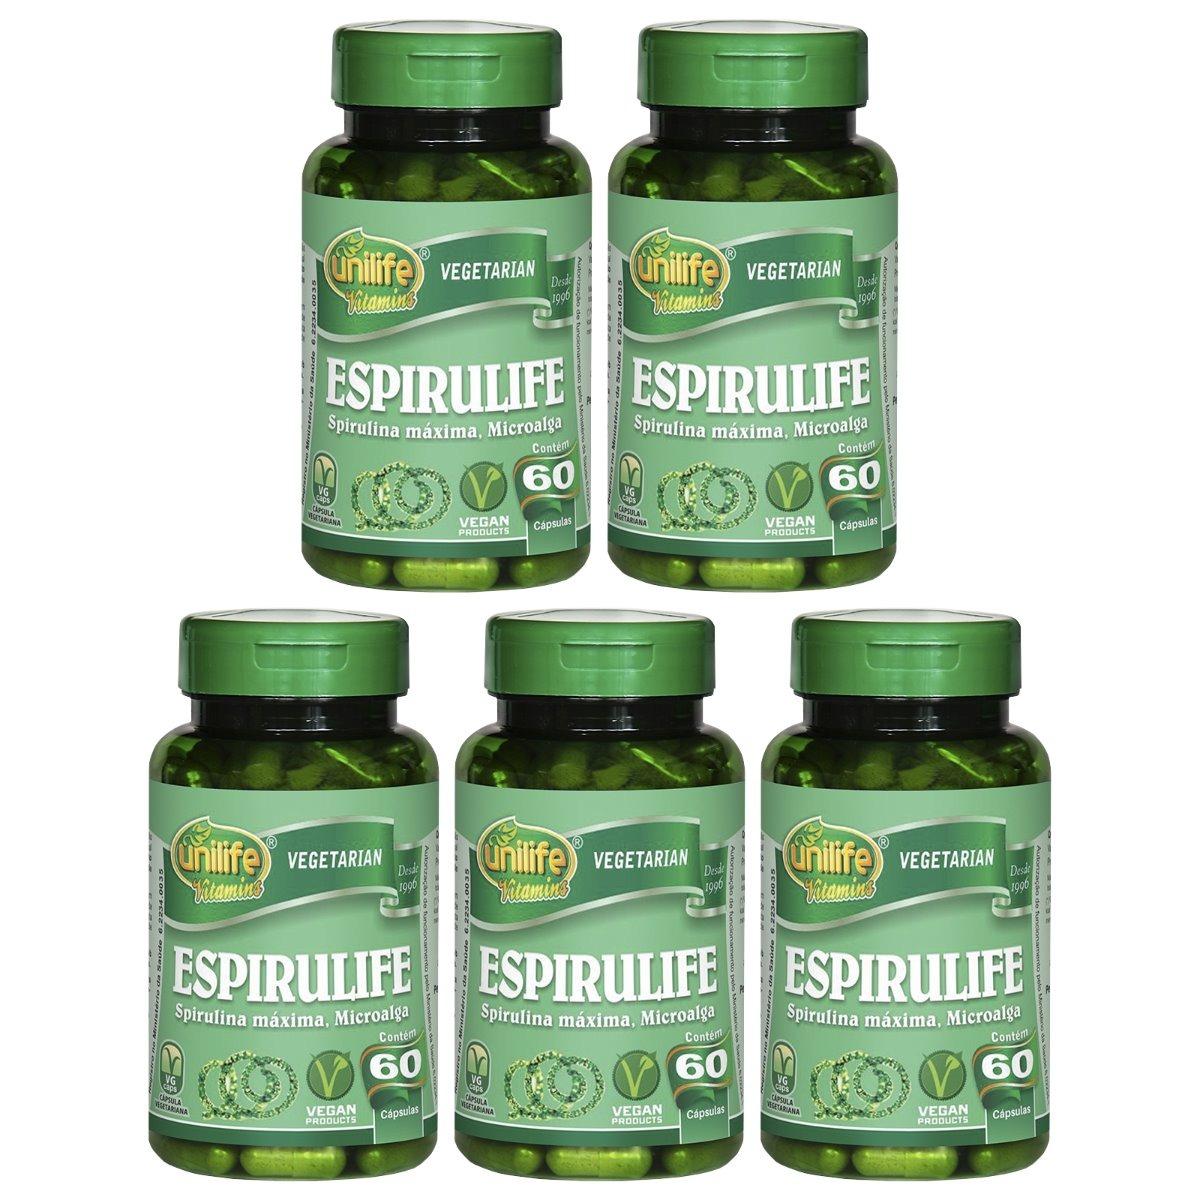 Spirulina Espirulife 60 Cápsulas 500mg Unilife Kit 5 Unidades